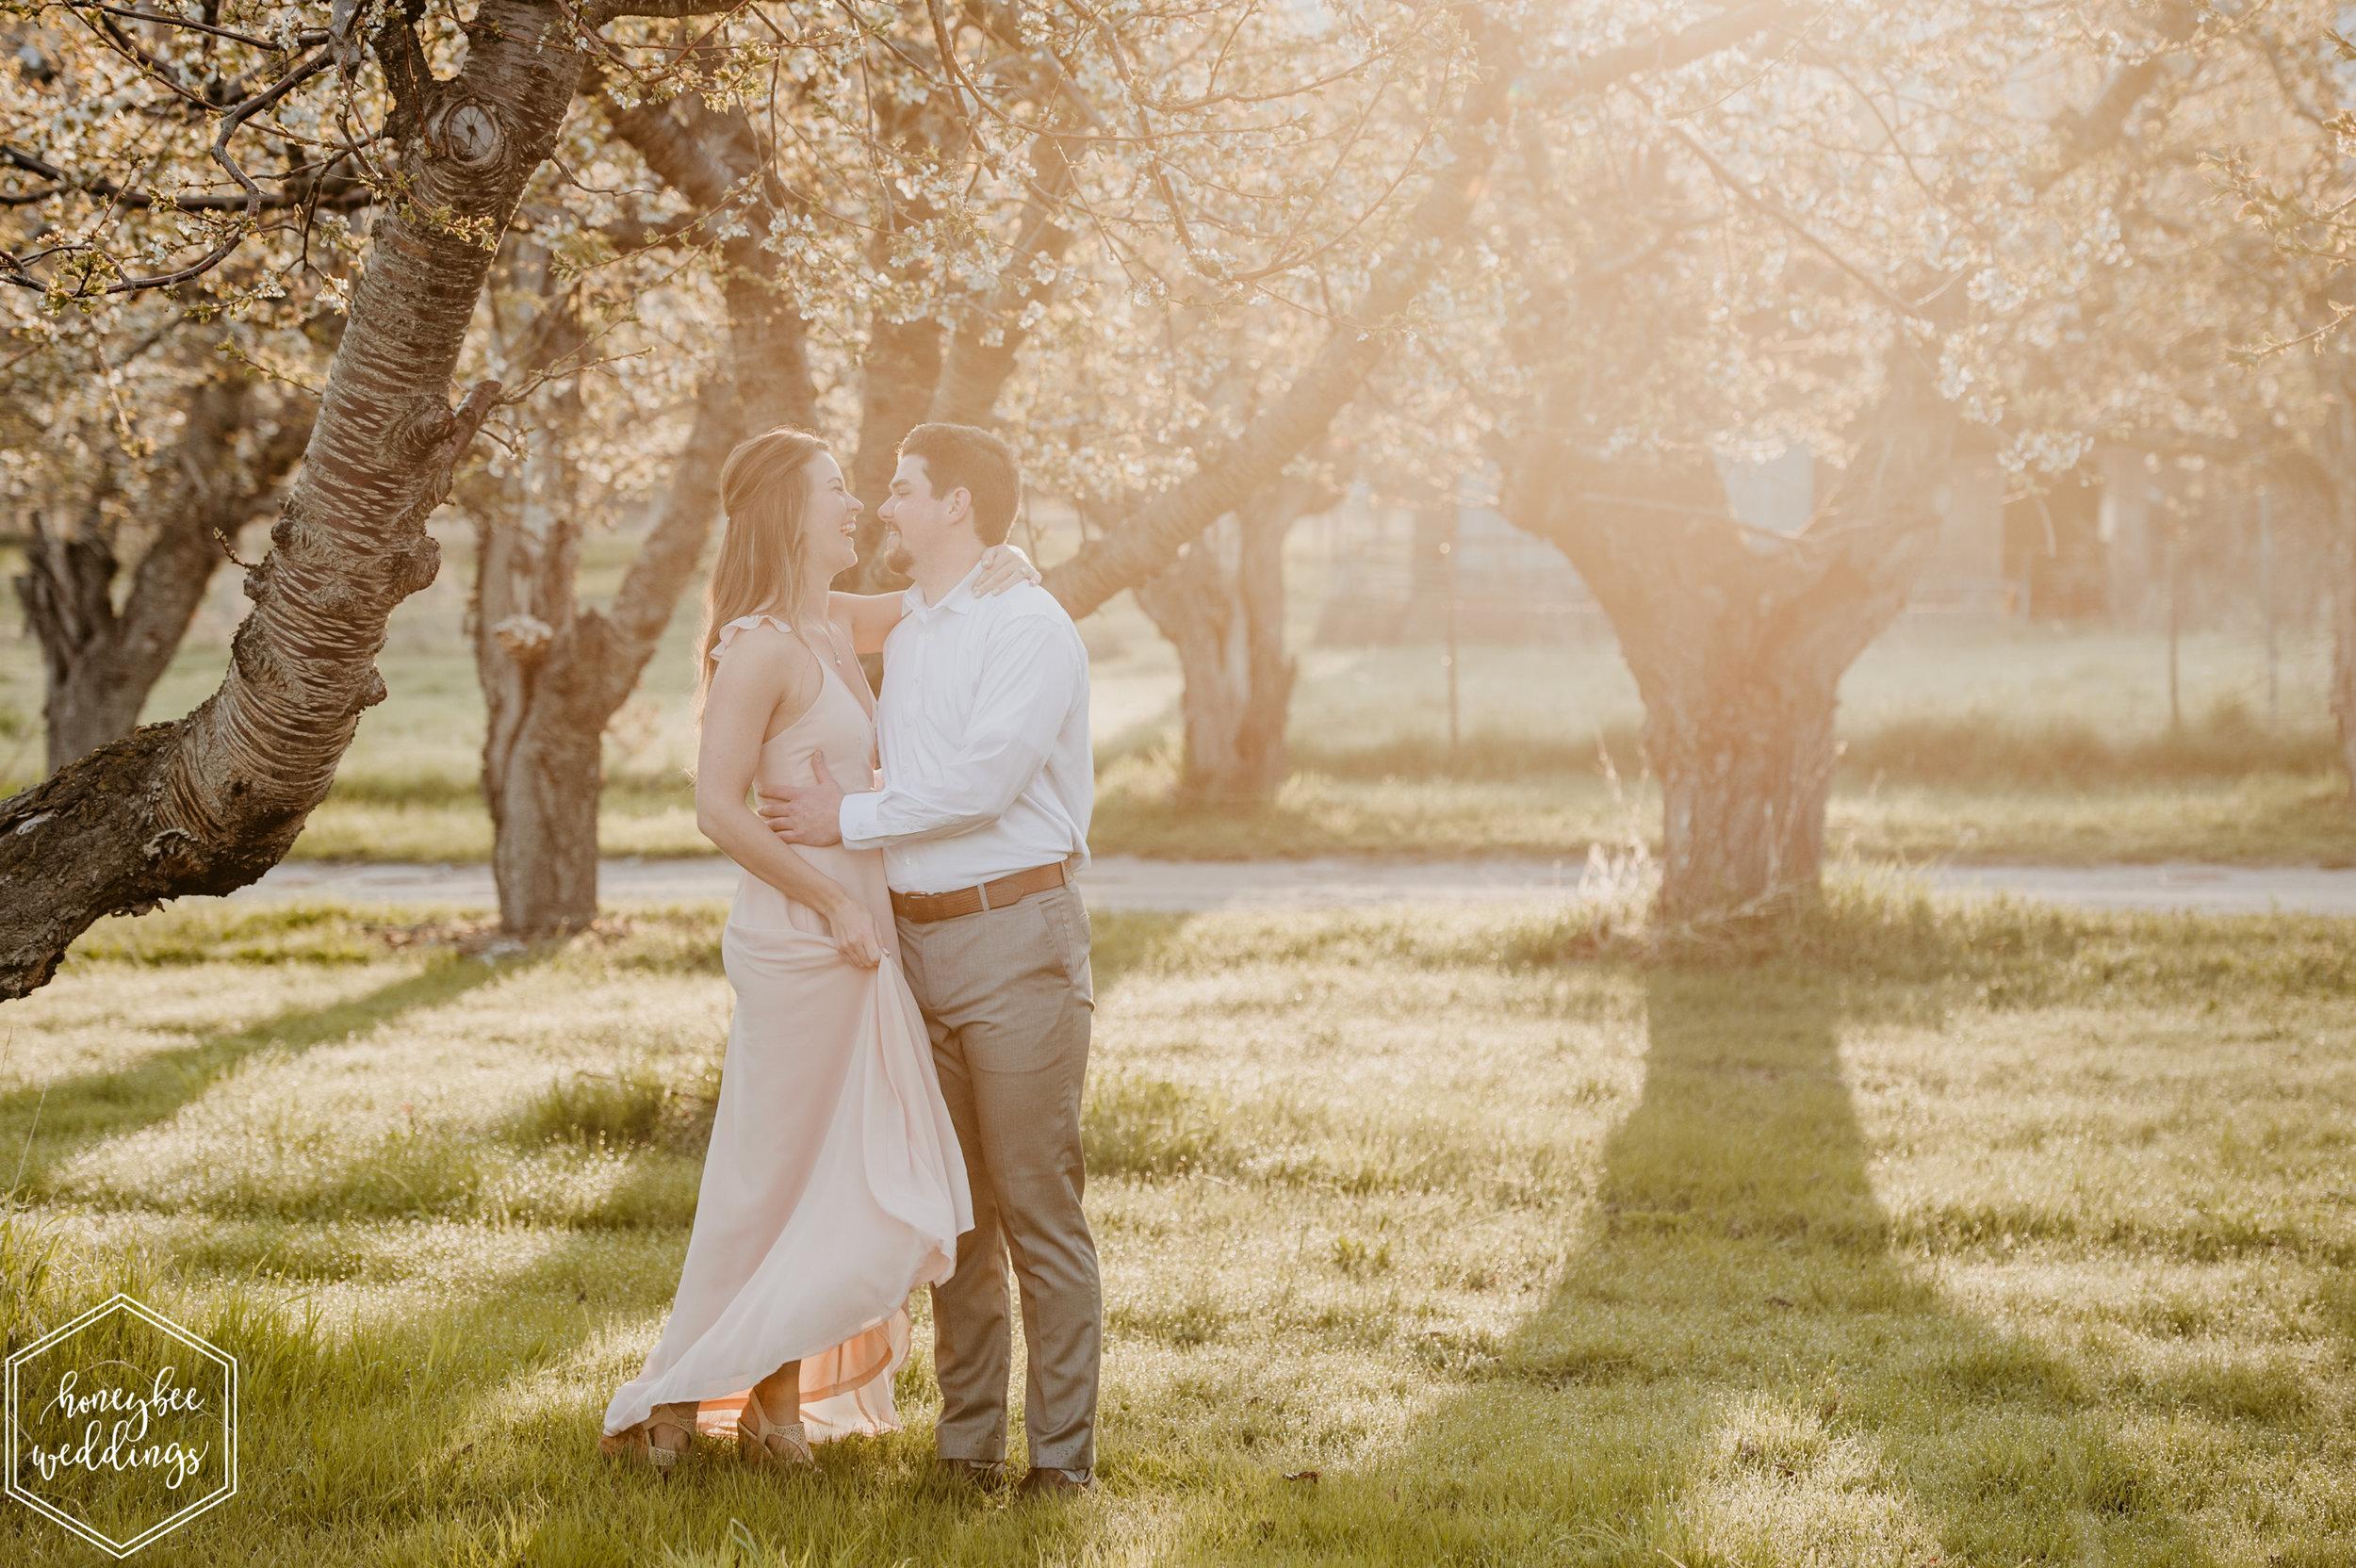 048Montana Wedding Photographer_Cherry Blossom Engagement Session_Ashlin & Luke_Honeybee Weddings_May 11, 2019-57.jpg